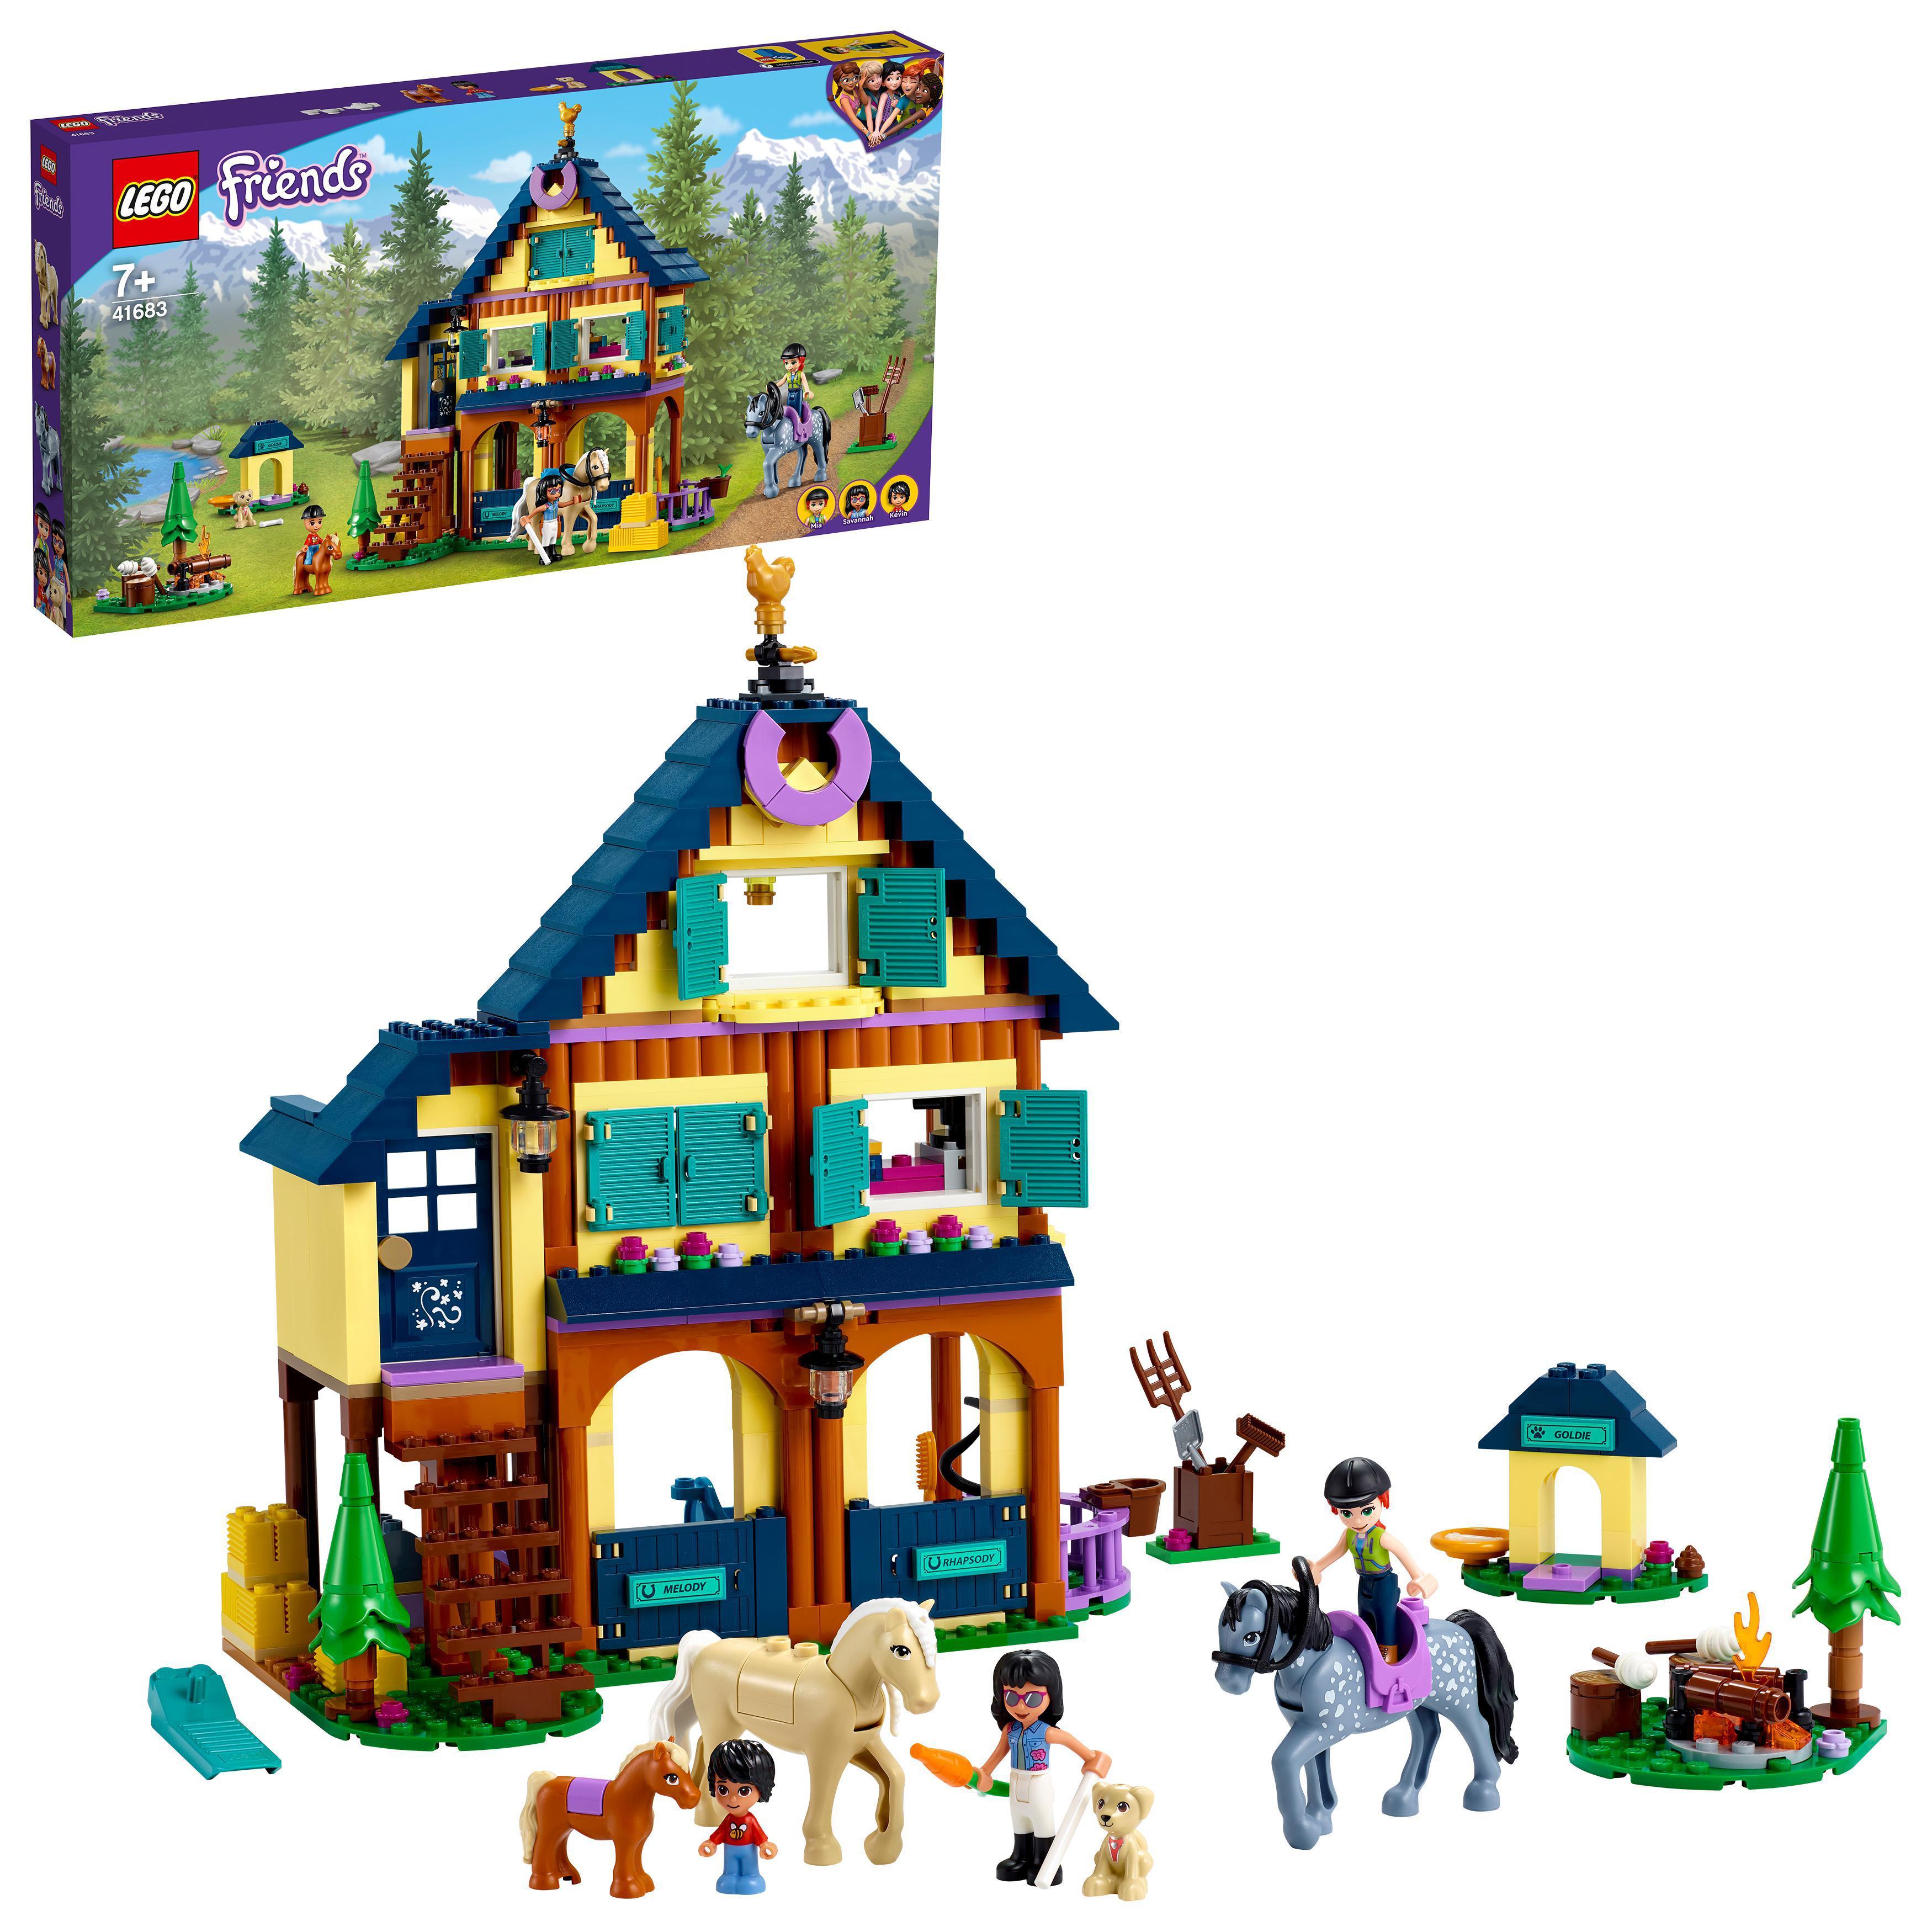 LEGO Friends - Forest Horseback Riding Center (41683)